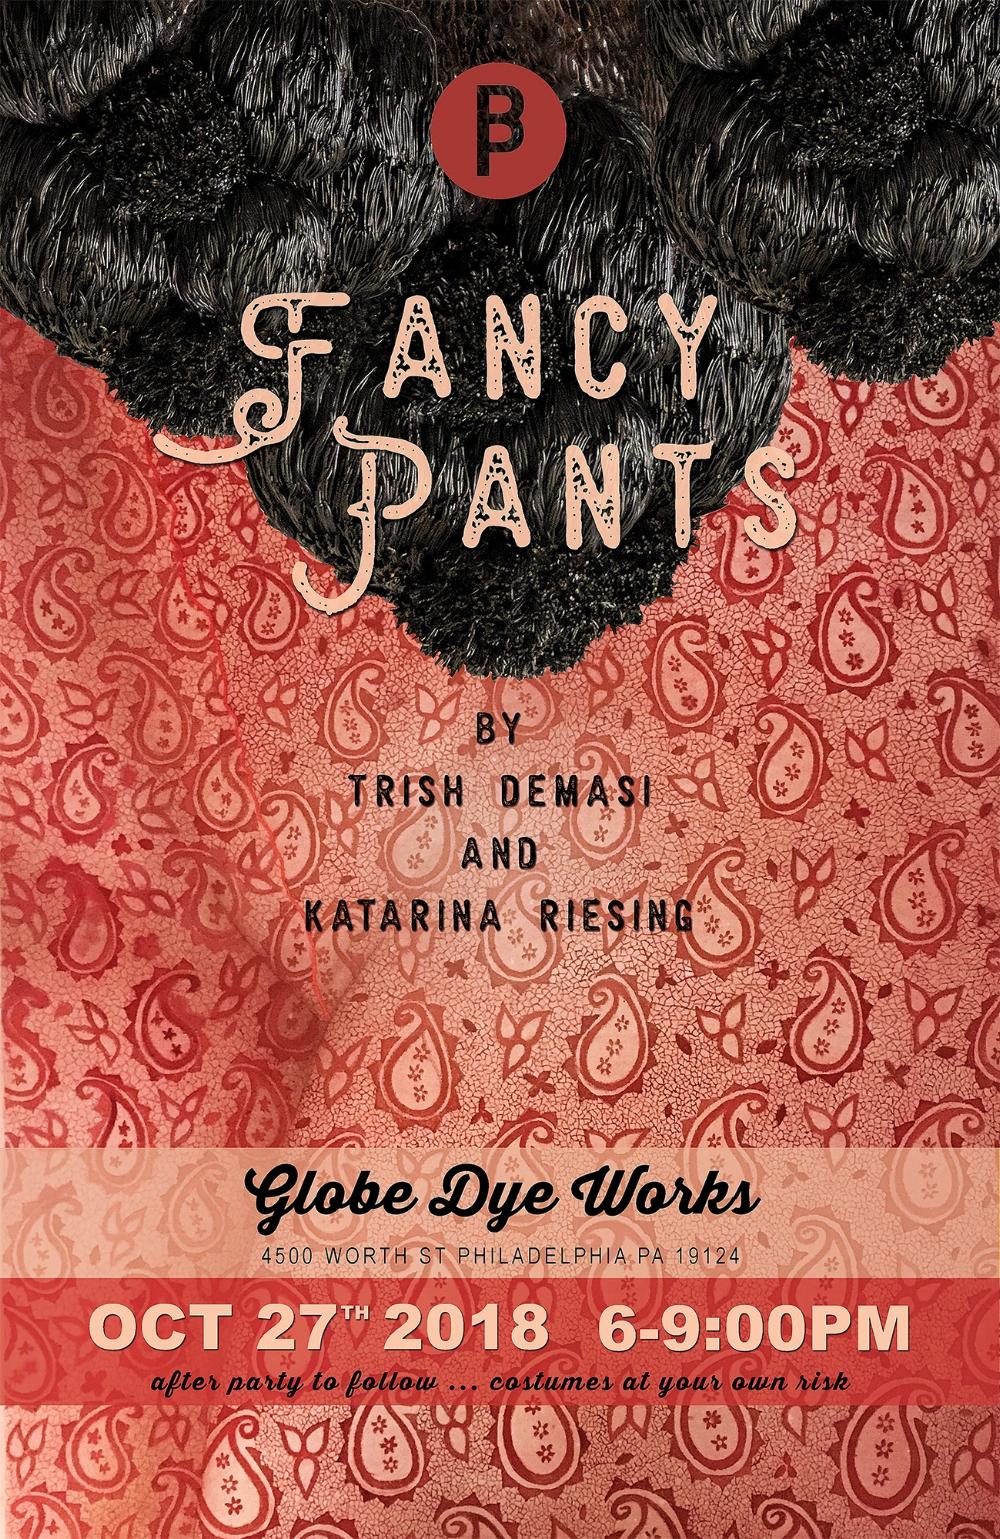 FANCY PANTS - Artists: Trish Demasi & Katarina RiesingOpening Party - Saturday Oct 27, 2018 6-9pmShow Open Oct 27 - Dec 1, 2018Globe Dye Works BuildingPhiladelphia PA USA